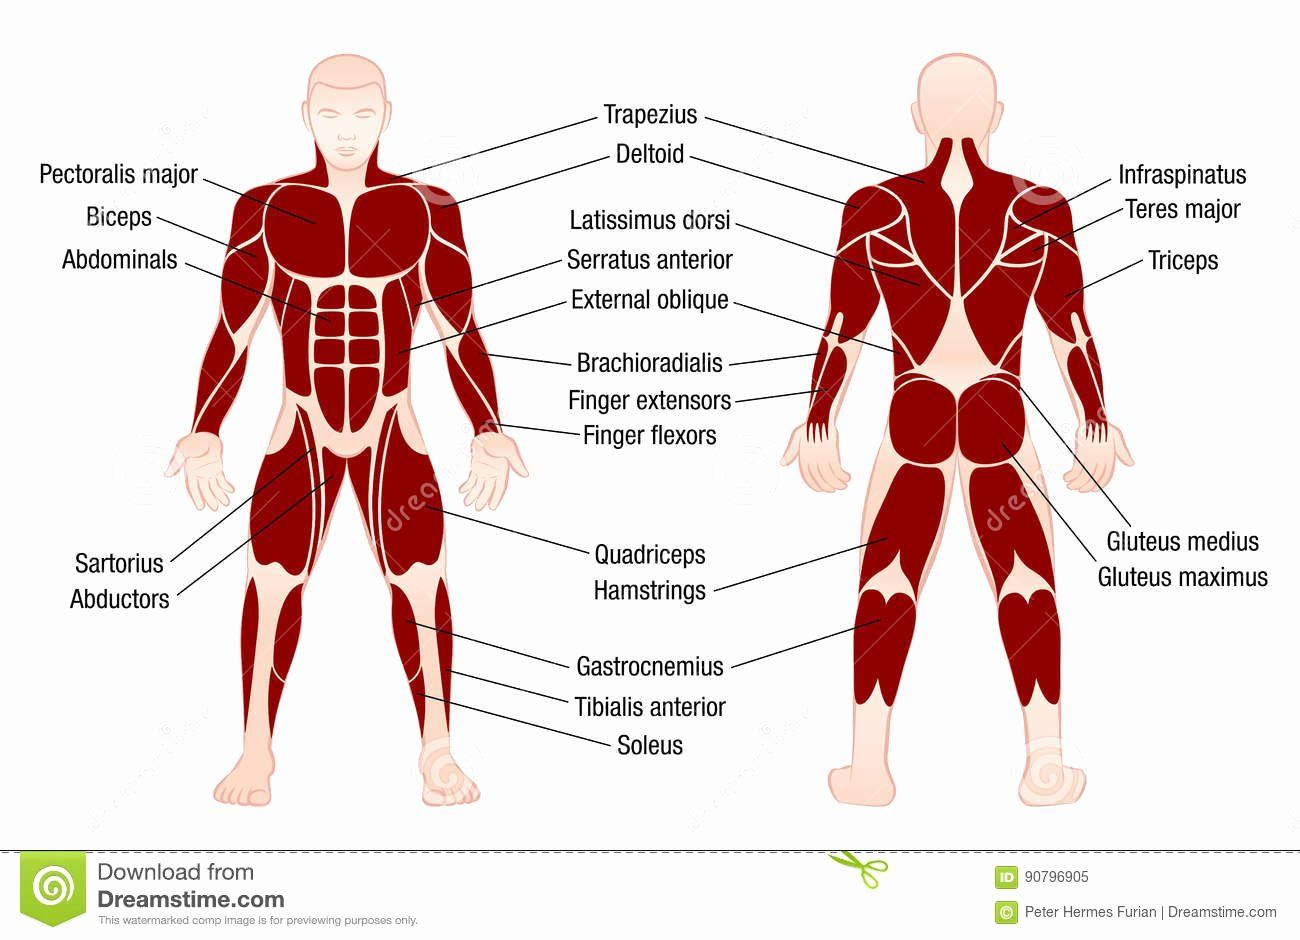 Muscle Anatomy Chart Fresh Muscles Chart Description Muscular Body Man Stock Vector In 2020 Human Body Muscles Muscle Diagram Body Muscle Chart